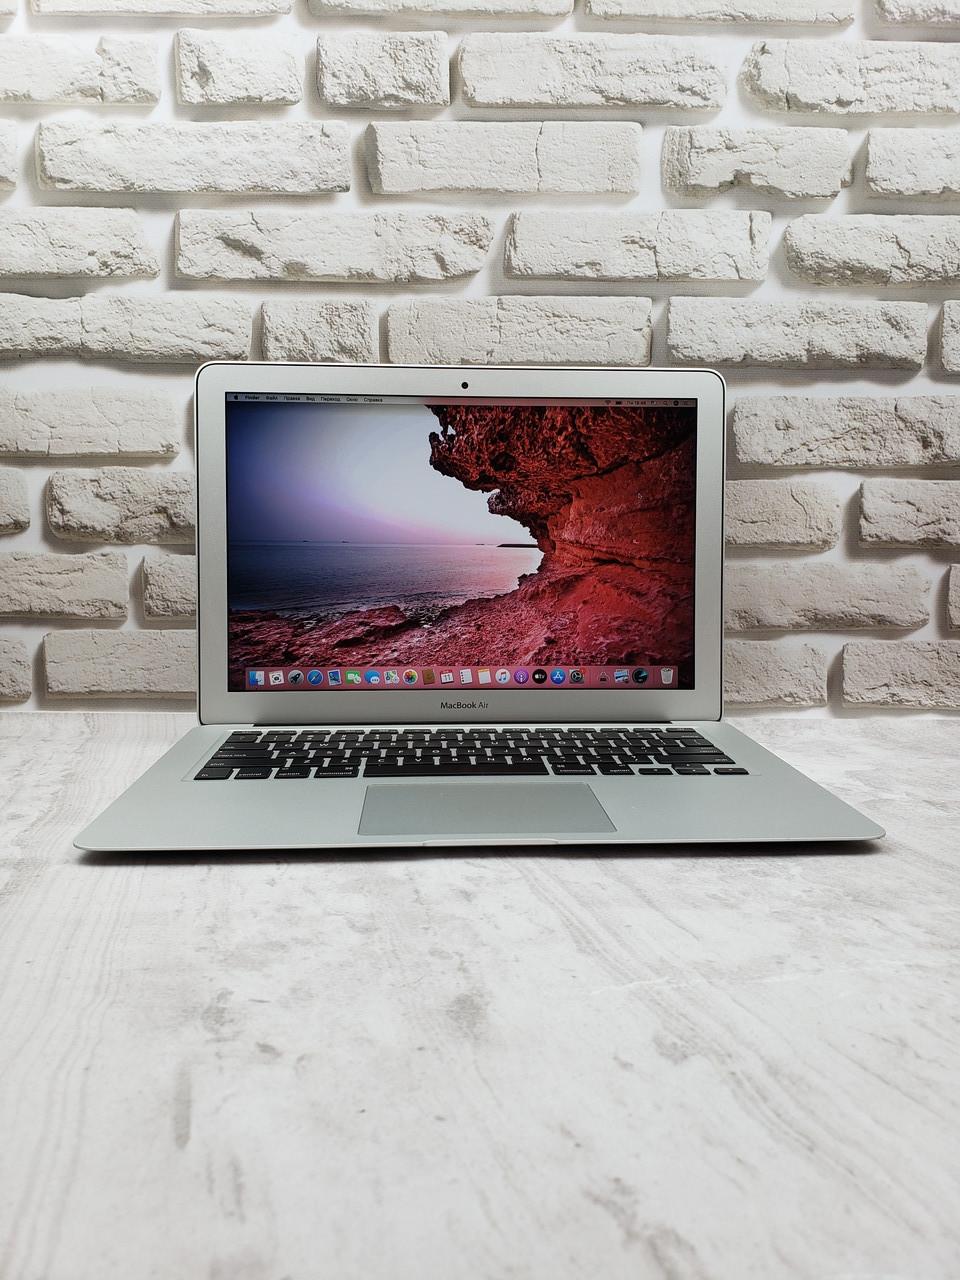 MacBook Air 13,3'' Mid 2015 i5 MJVE2 8Gb 256Gb SSD  Магазин Гарантия